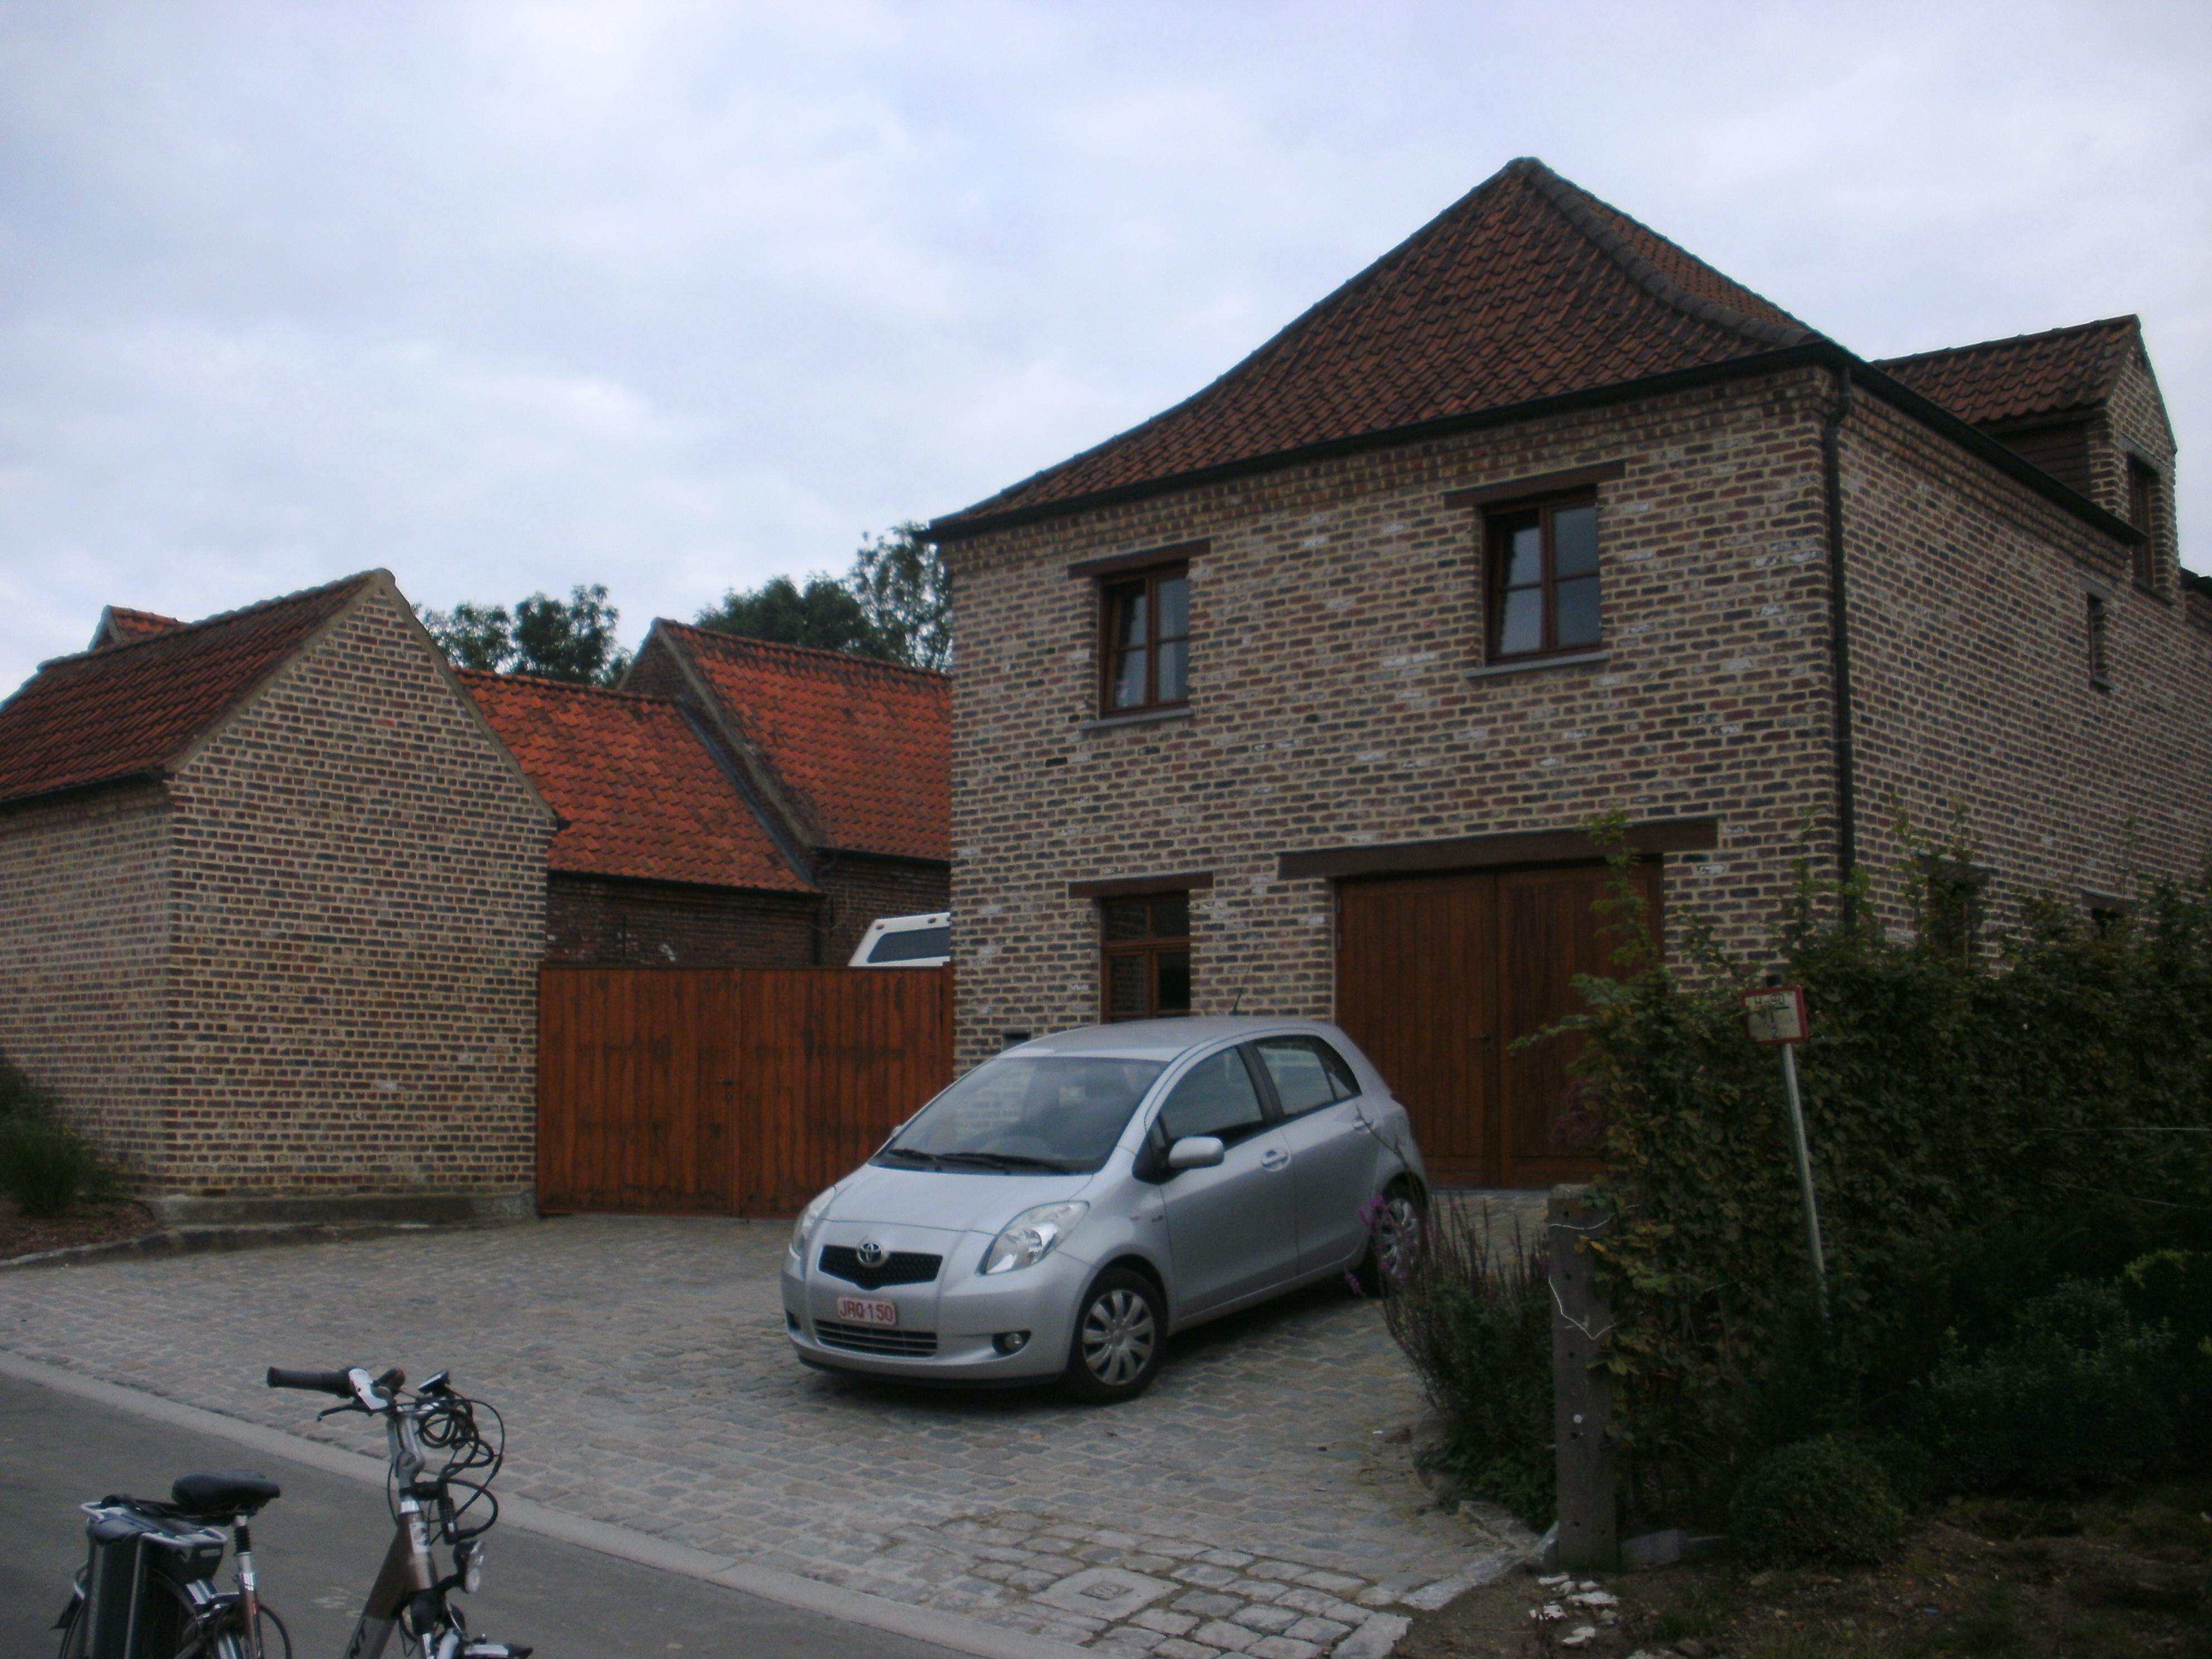 File Aaigem Hoeve Aaigembergstraat 16 Jpg Wikimedia Commons